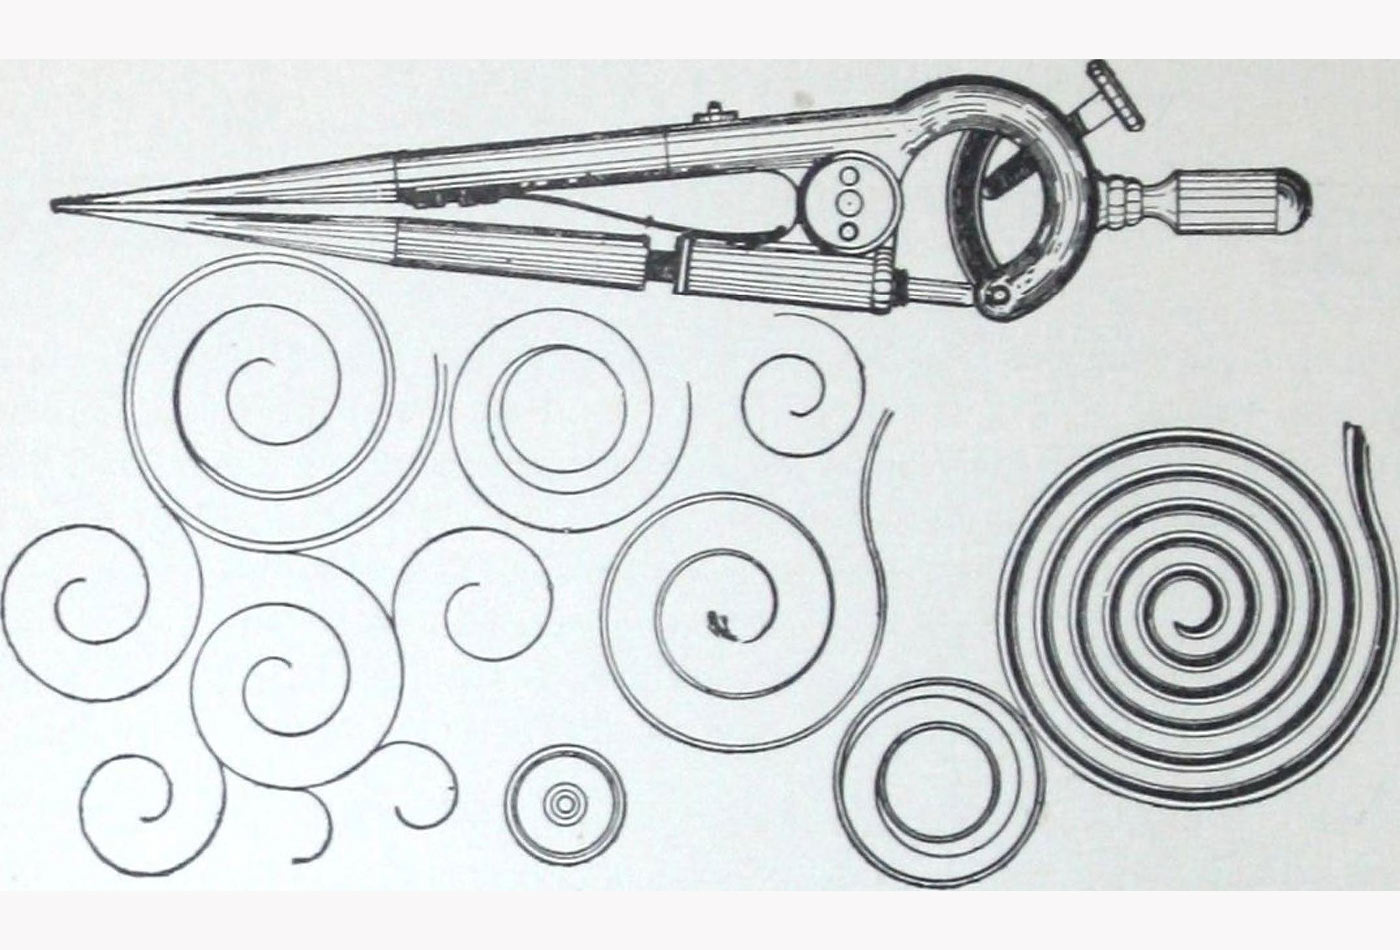 Tracing tools